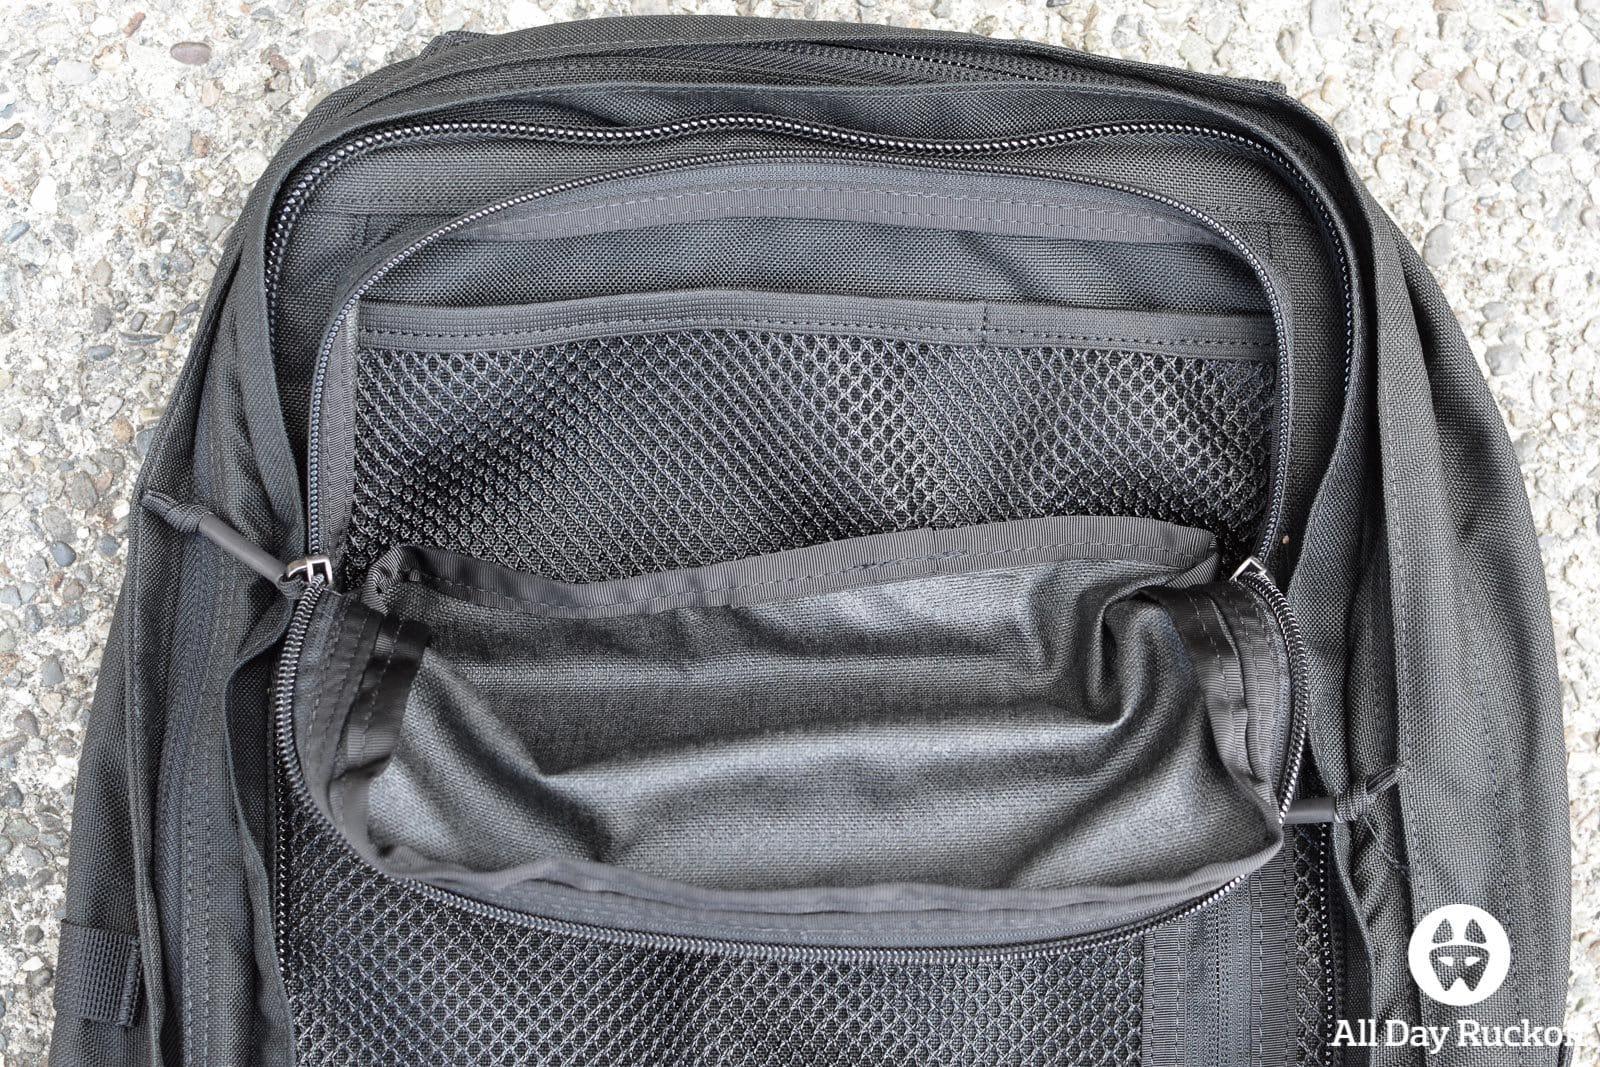 GORUCK GR2 34L - Pocket